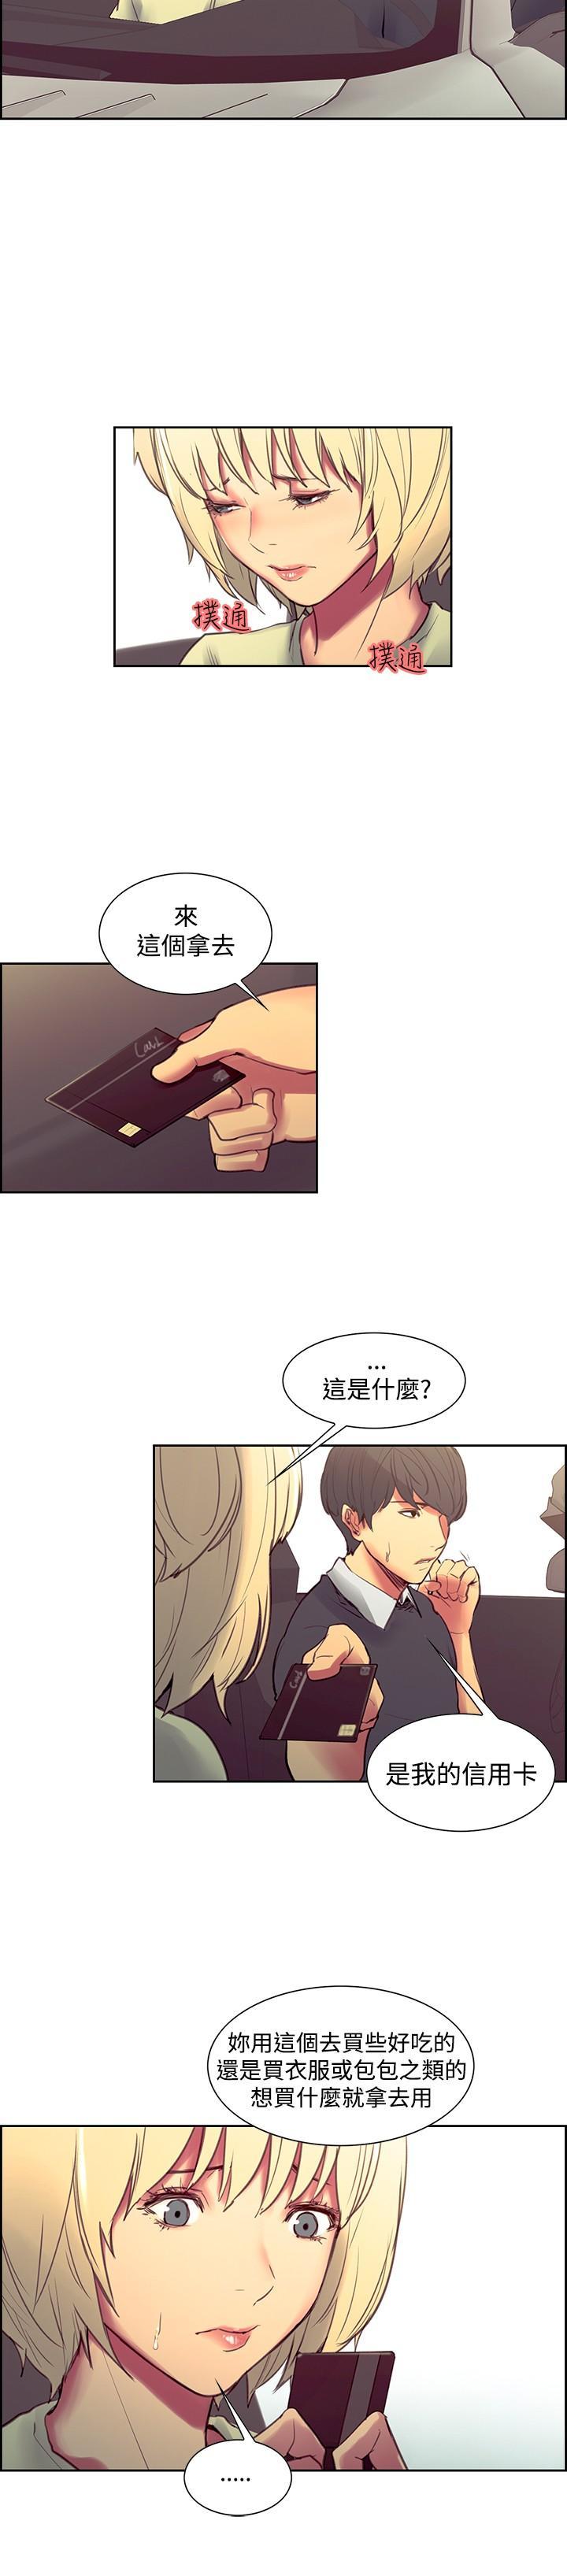 Domesticate the Housekeeper 调教家政妇 ch.29-32 27